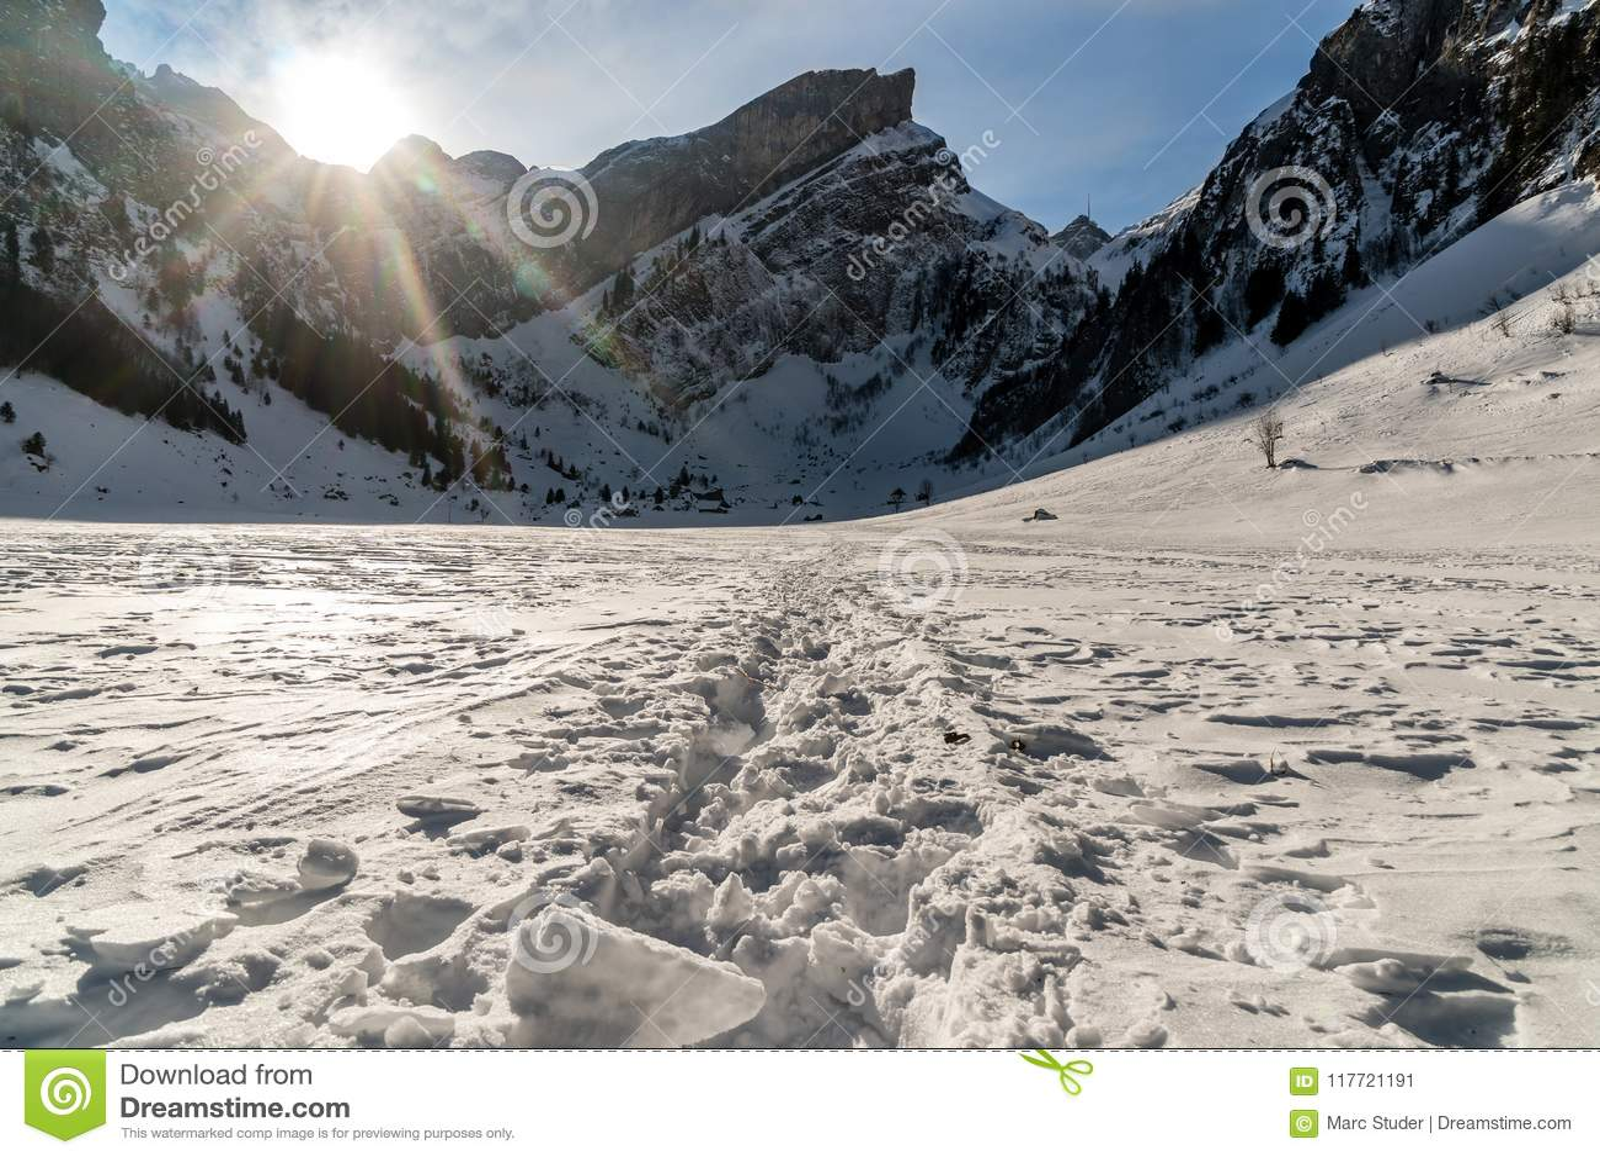 Seealpsee, ελβετικά βουνά κατά τη διάρκεια του χειμώνα με τα βήματα